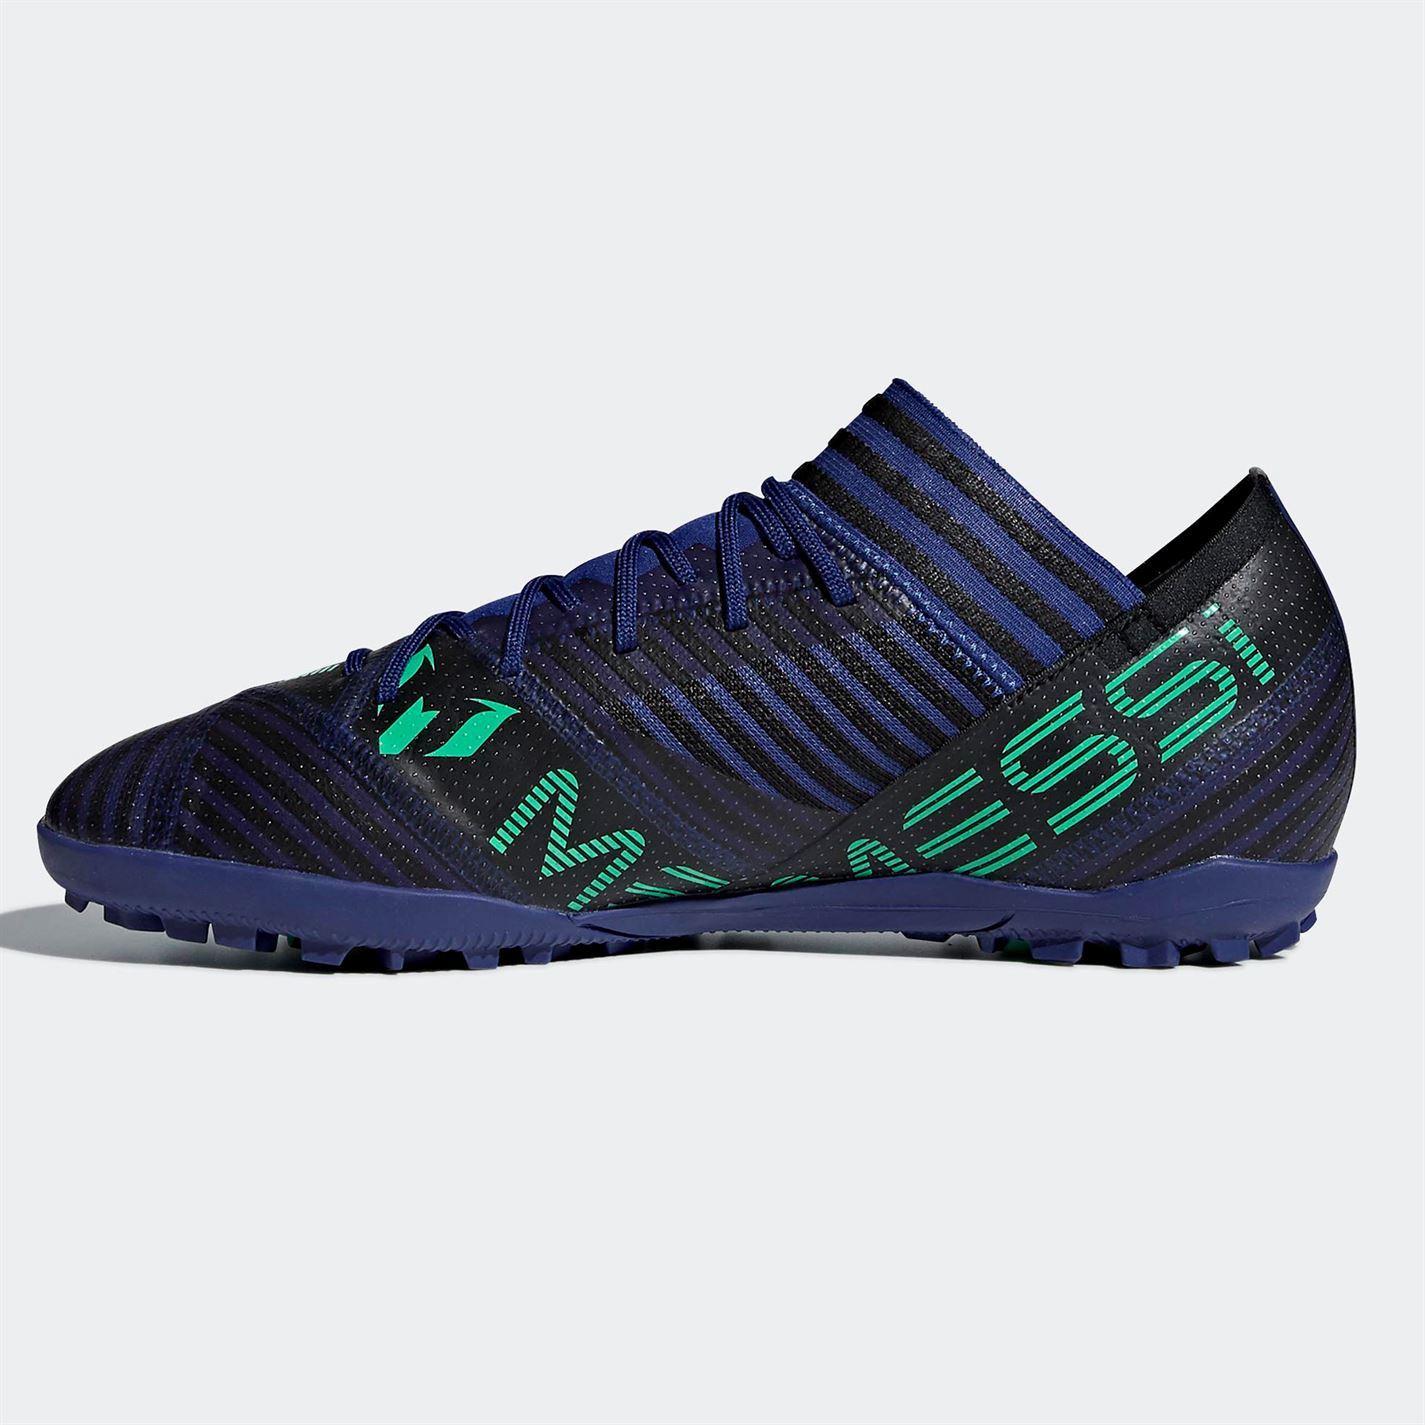 adidas astro turf boots uomo size 10